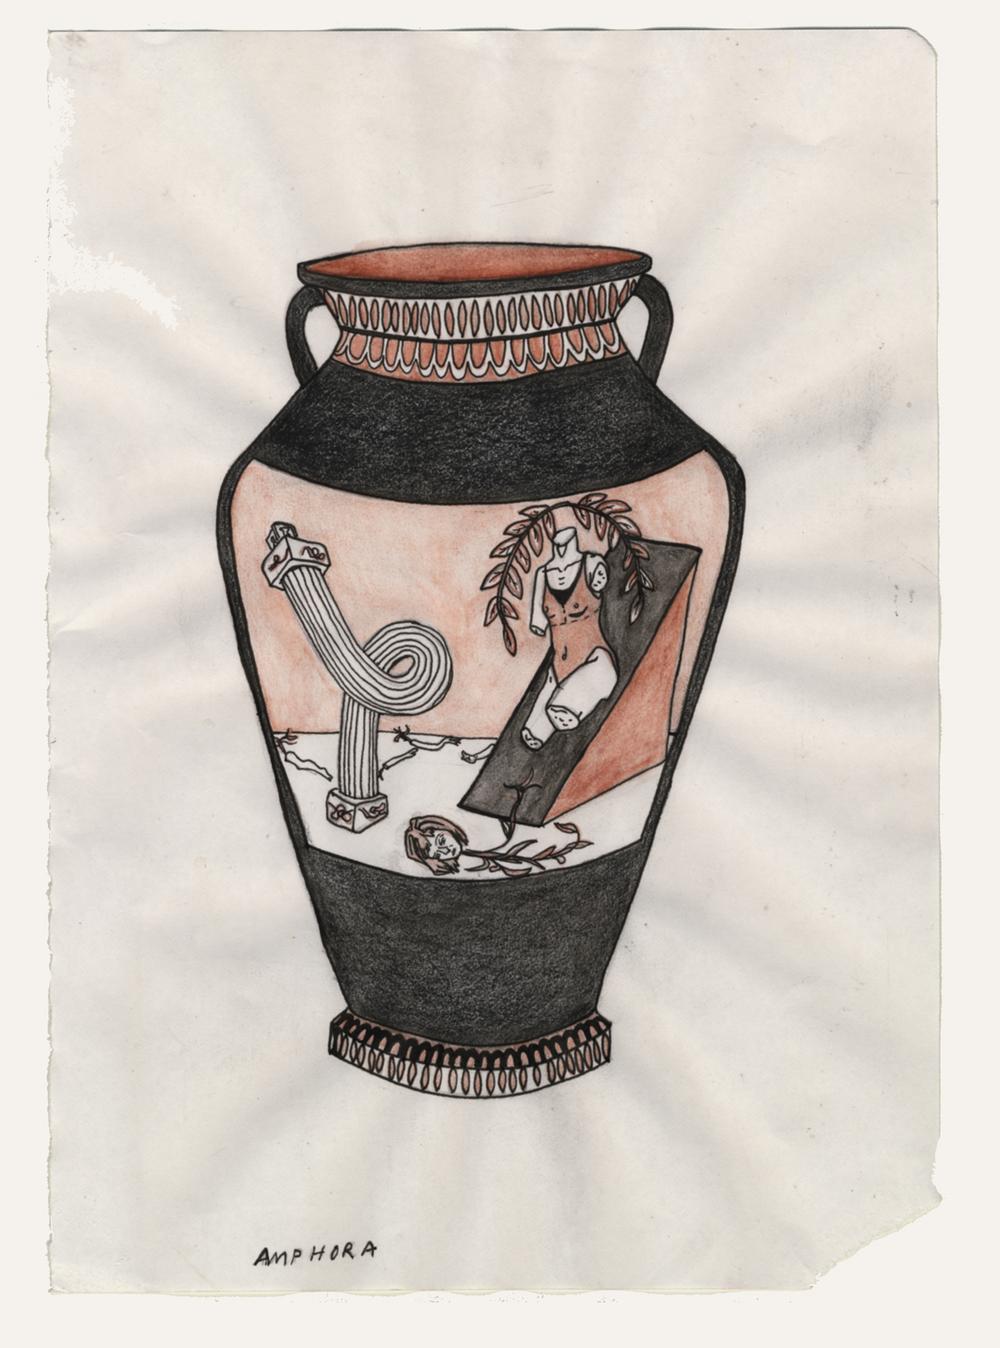 Amphora: Modern Aphrodite Psychic Landscape